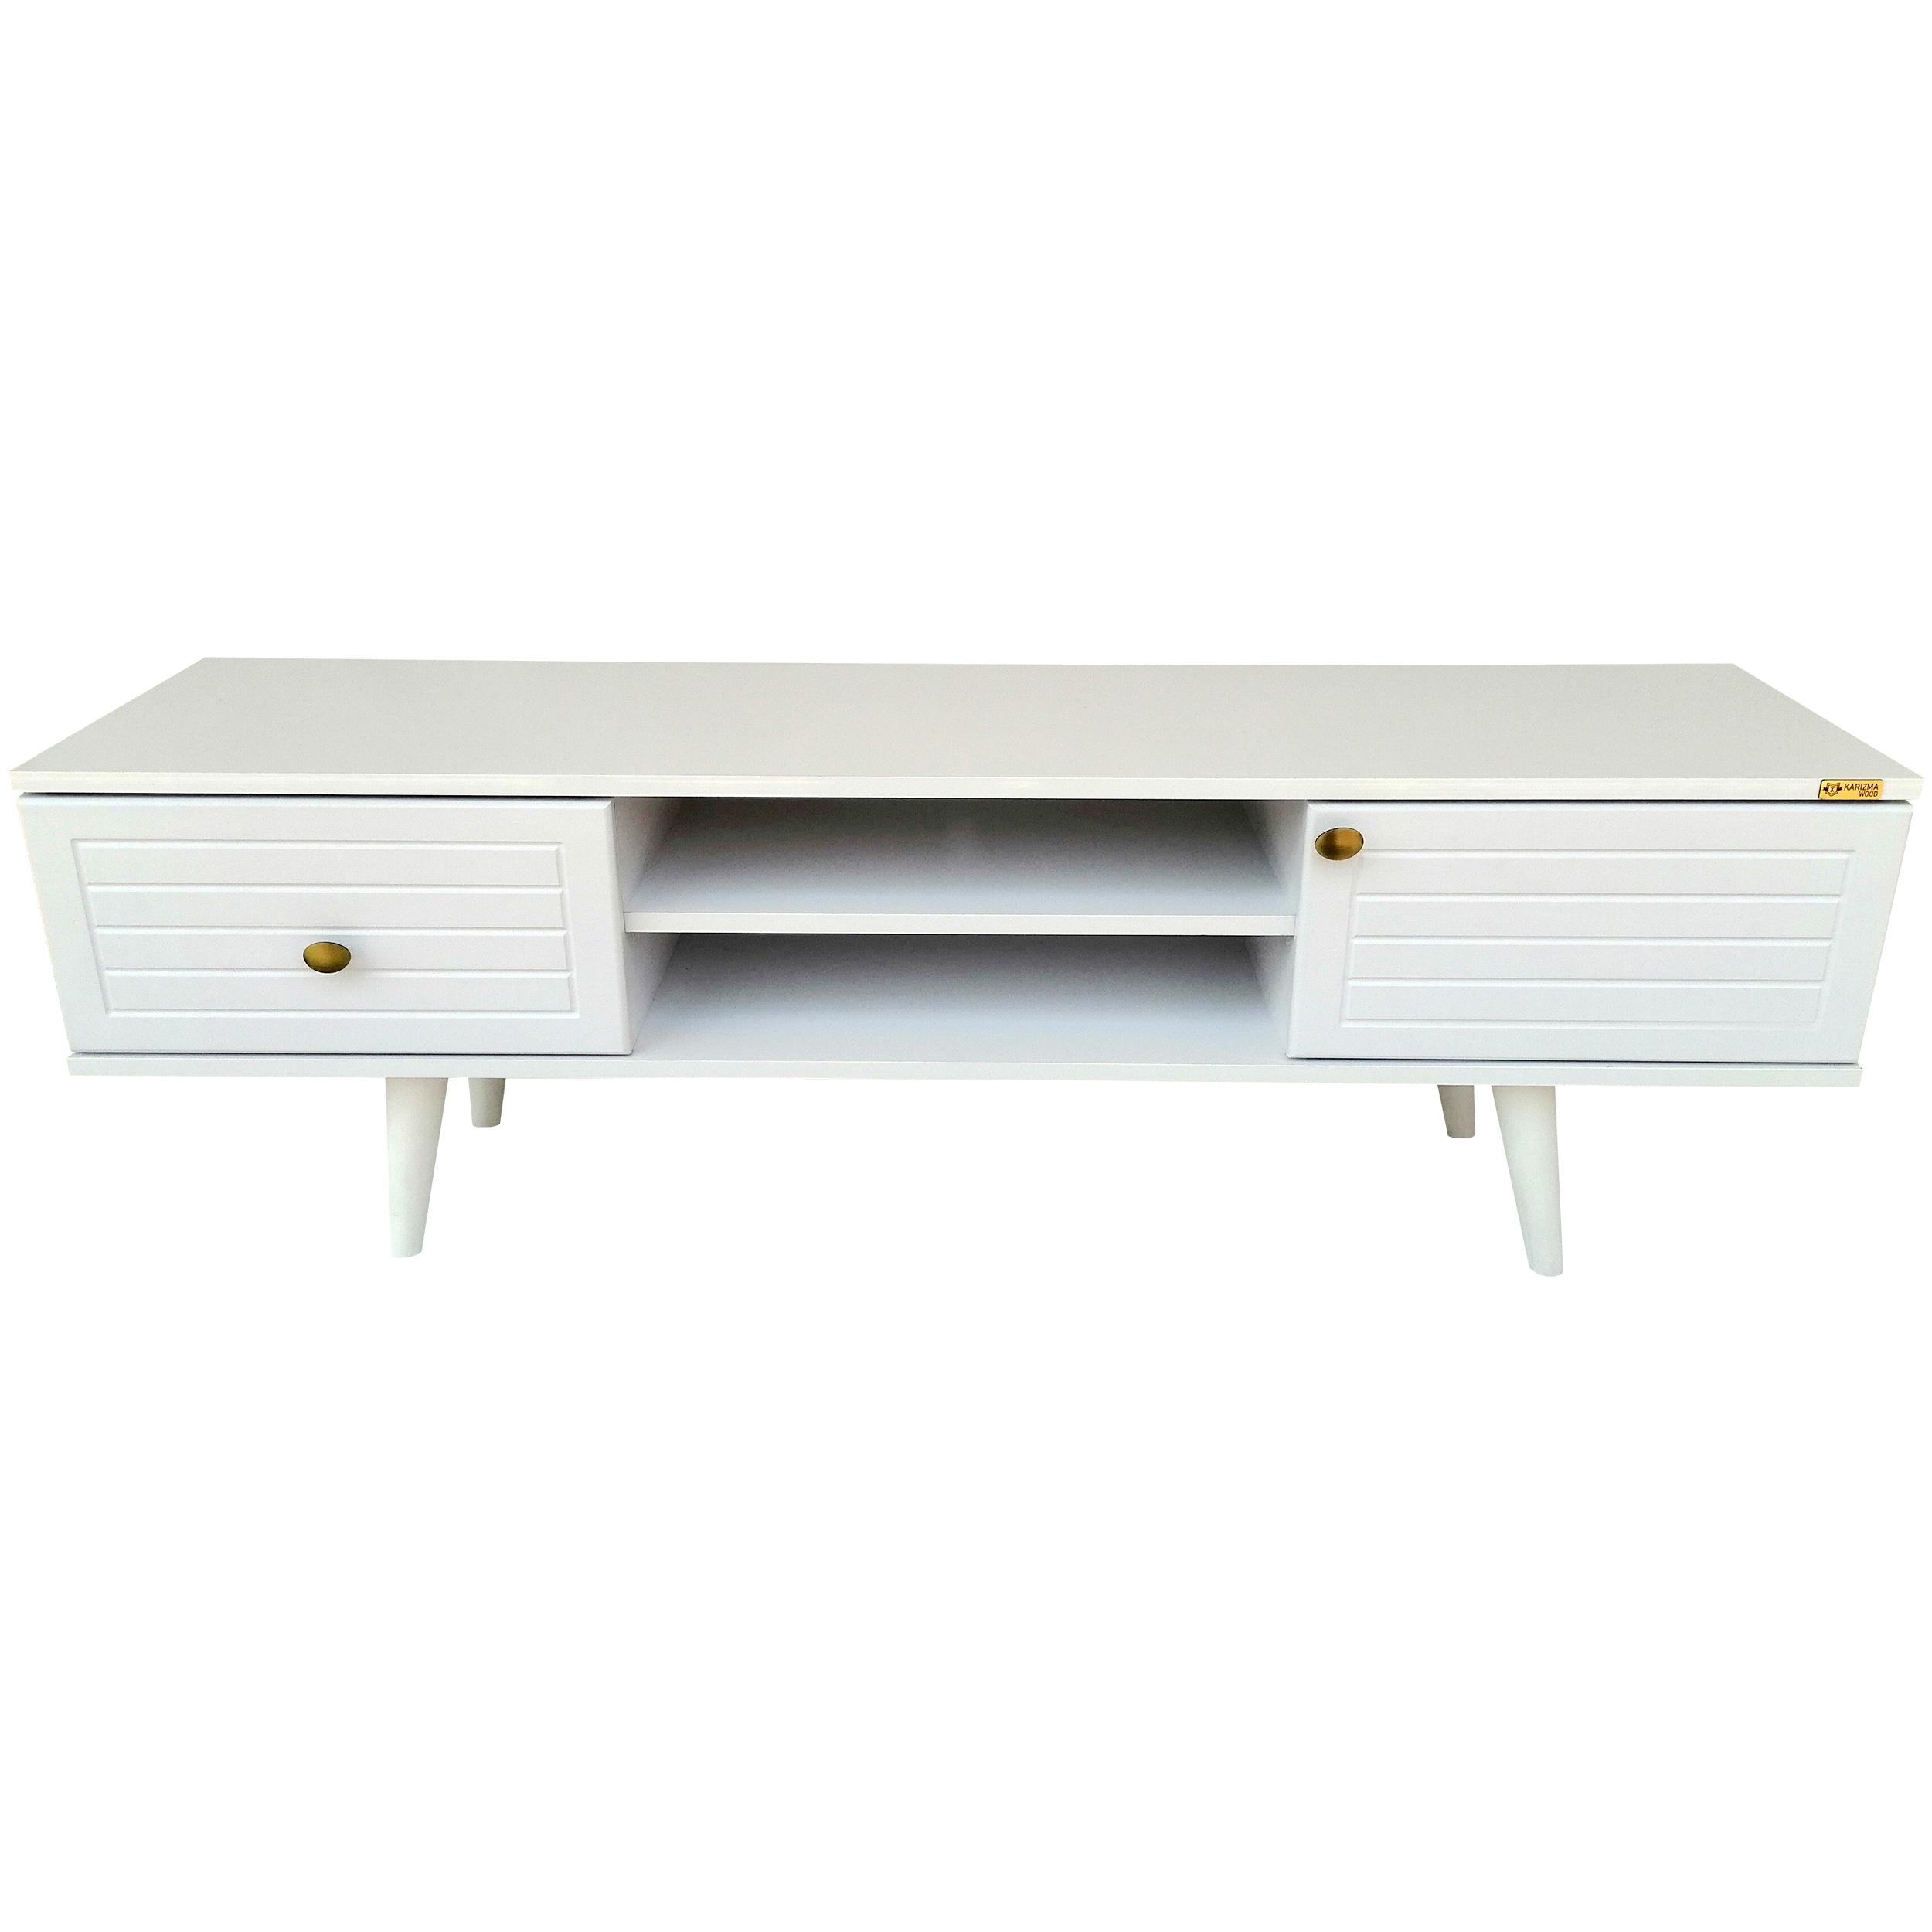 میز تلویزیون کاریزما وود مدل W211